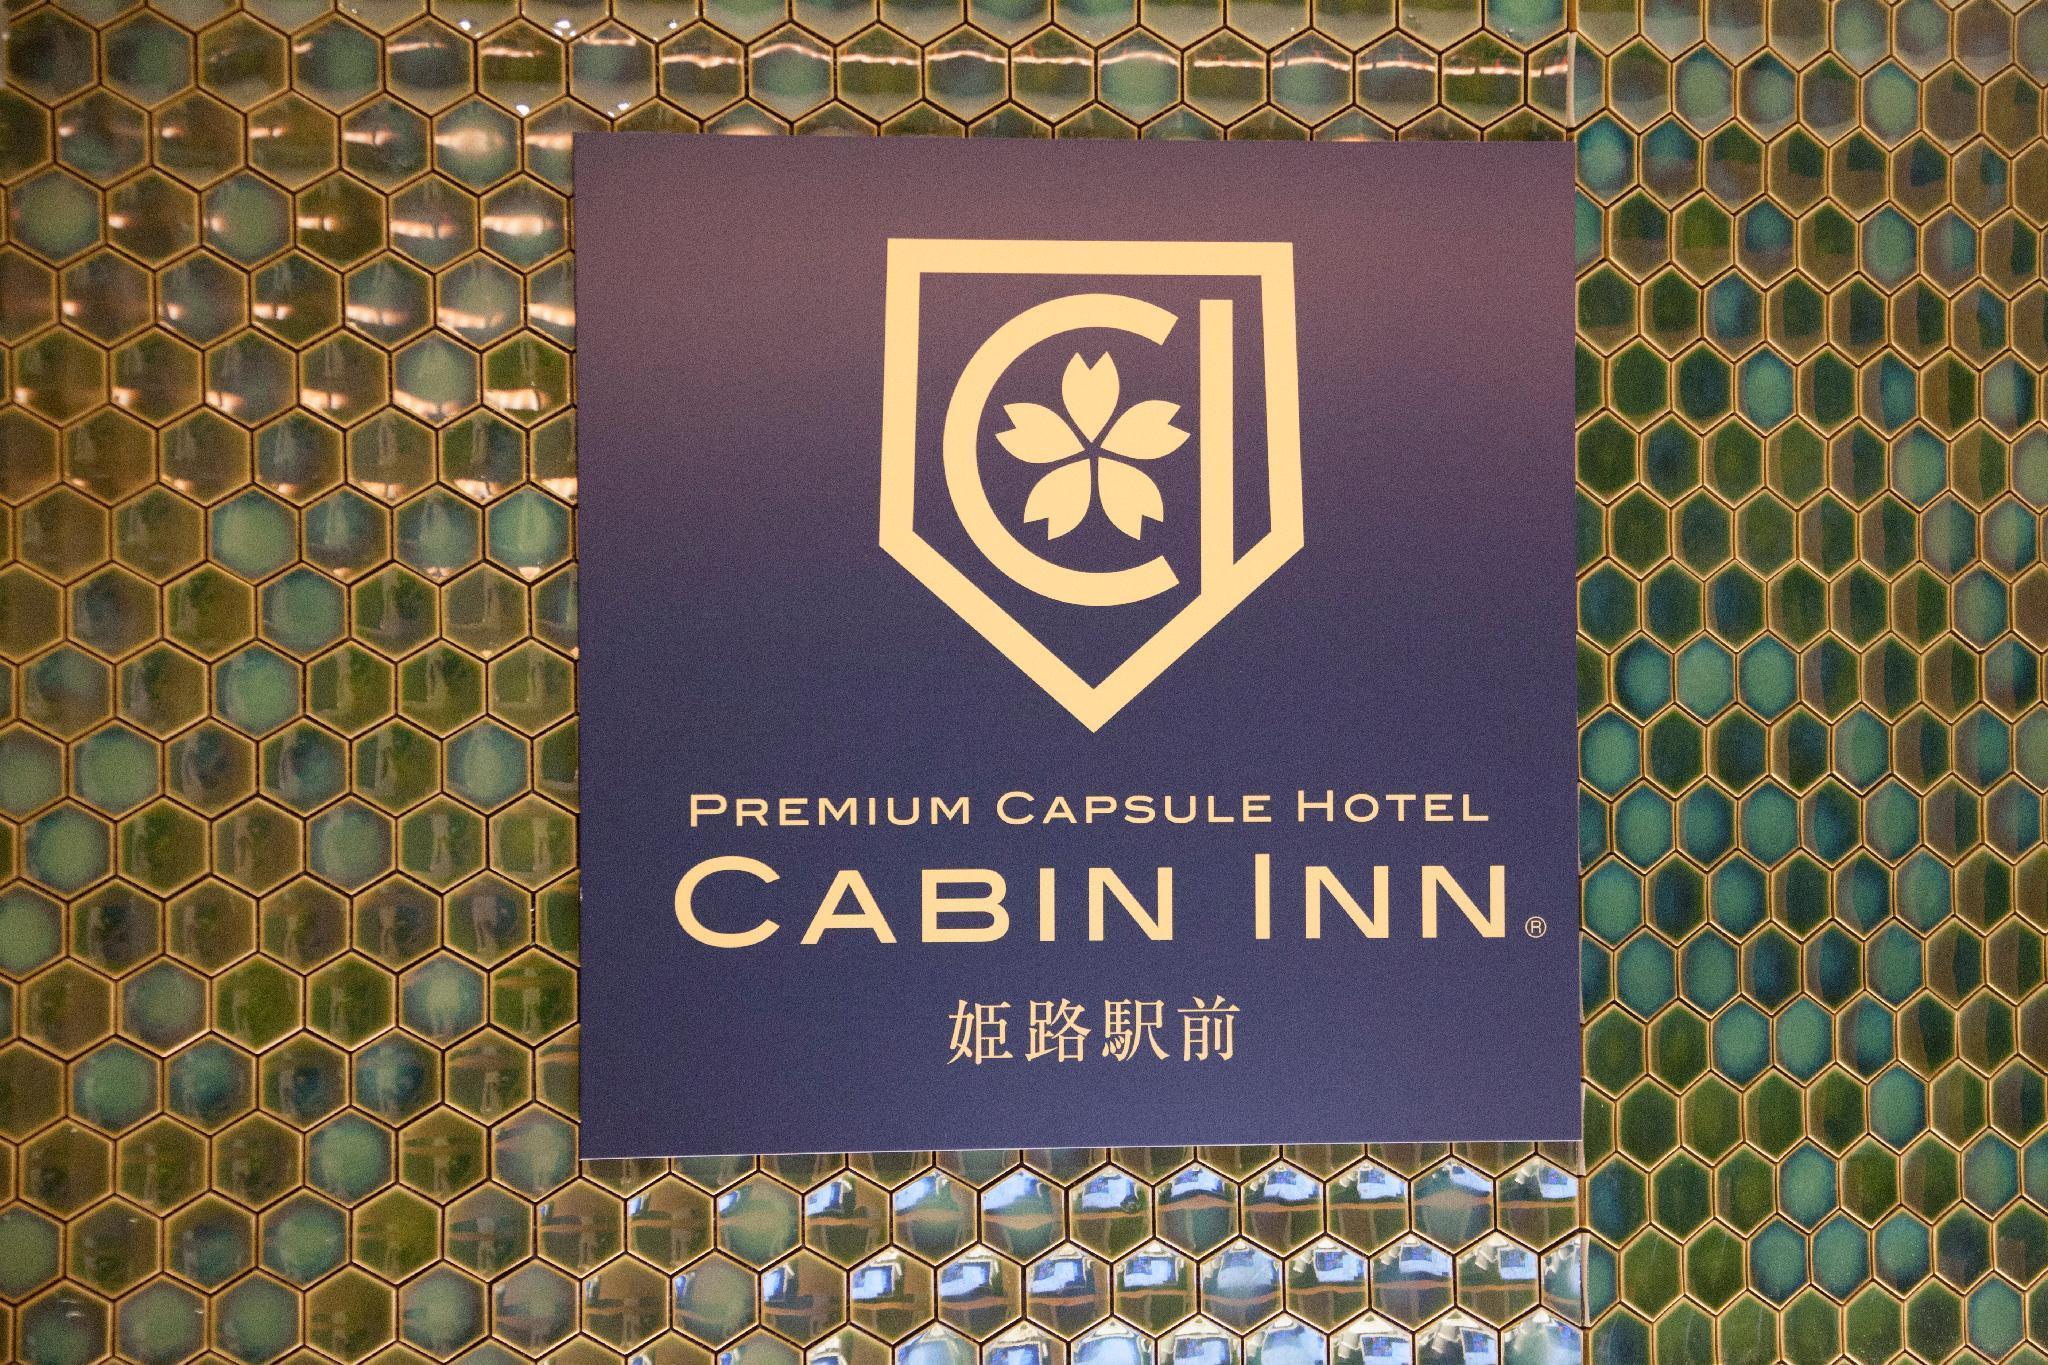 CABIN INN Himejiekimae